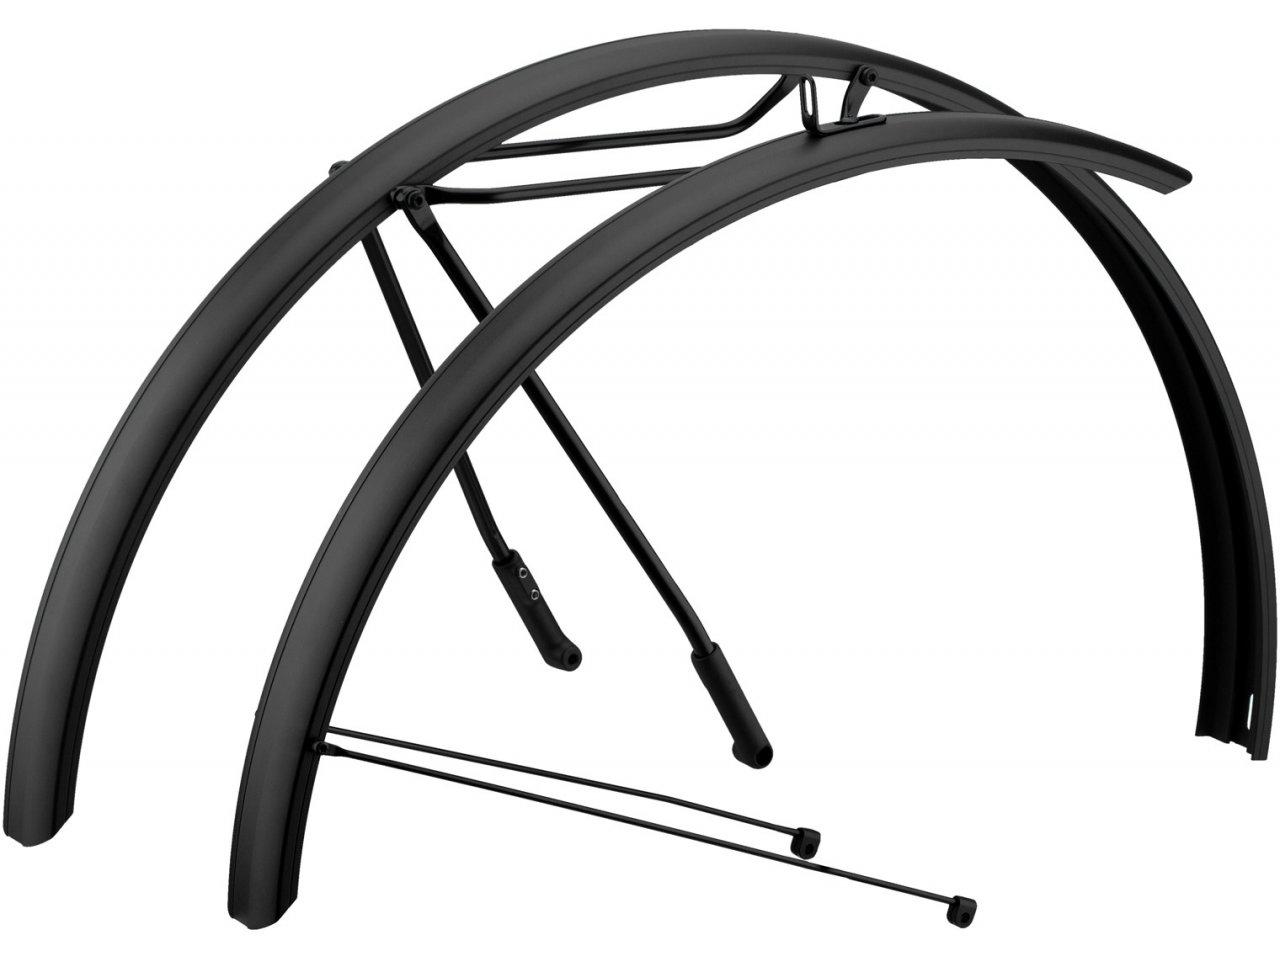 Hebie-Wingee-Schutzblech-Gepaecktraegersystem-Set-VR-HR-schwarz-52-mm-28--76568-322940-158454...jpeg